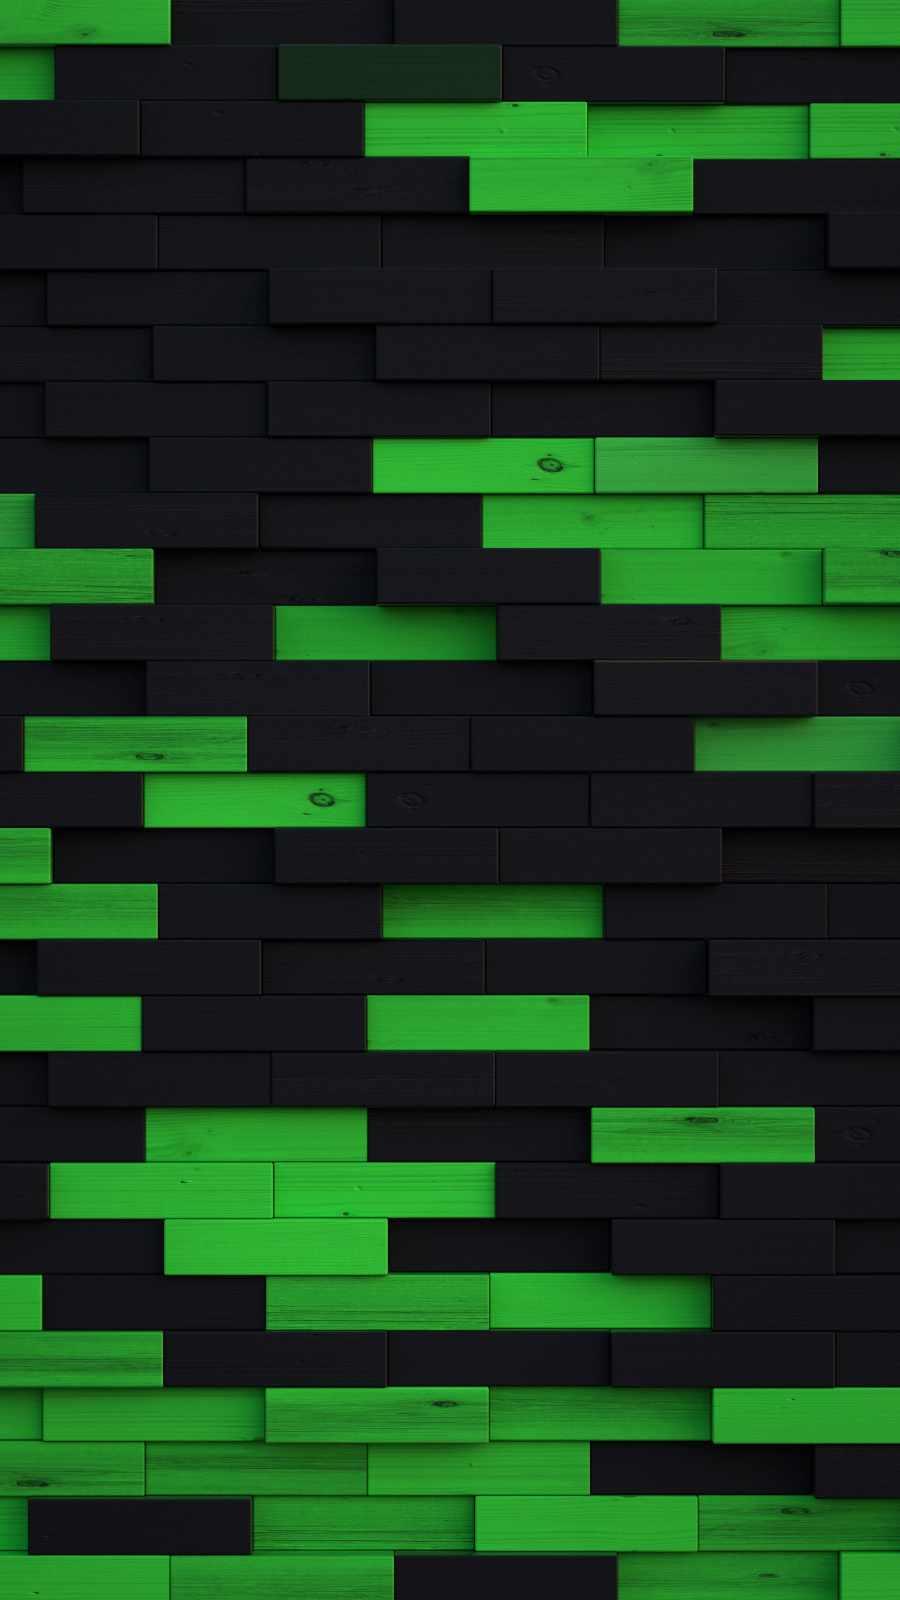 Green Blocks Wooden